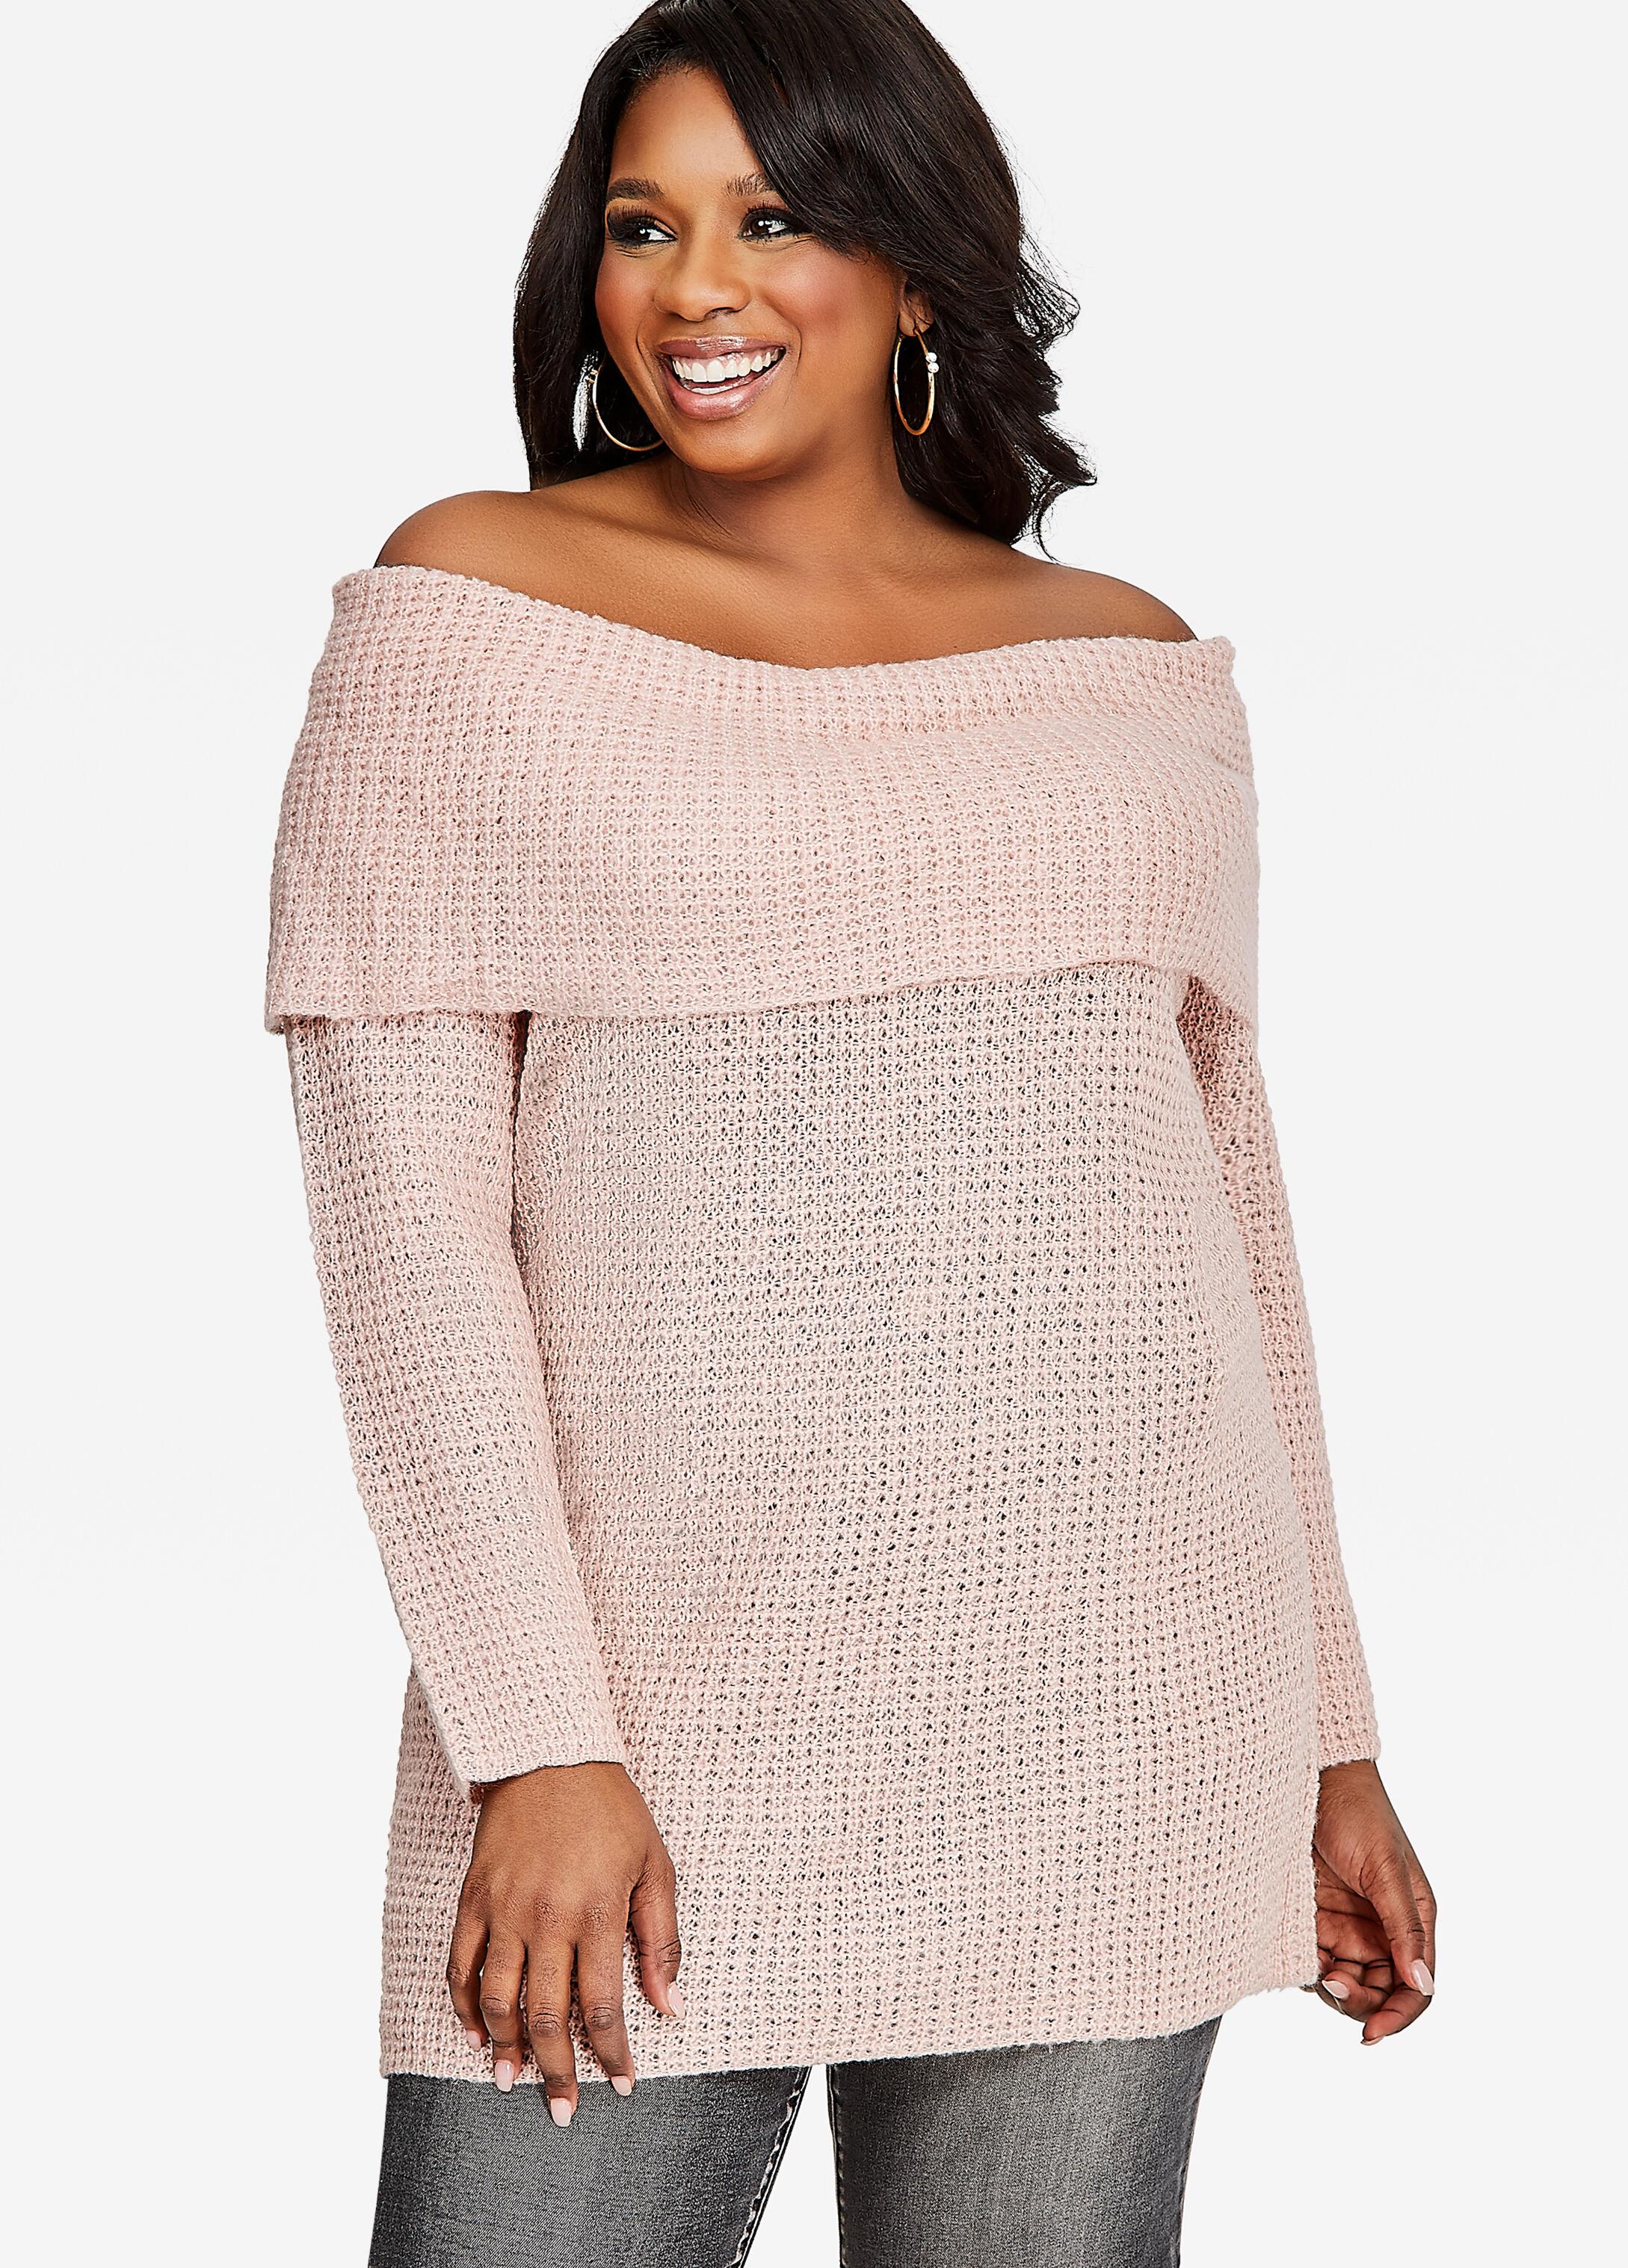 Plus-Size Off-Shoulder Tops | Ashley Stewart